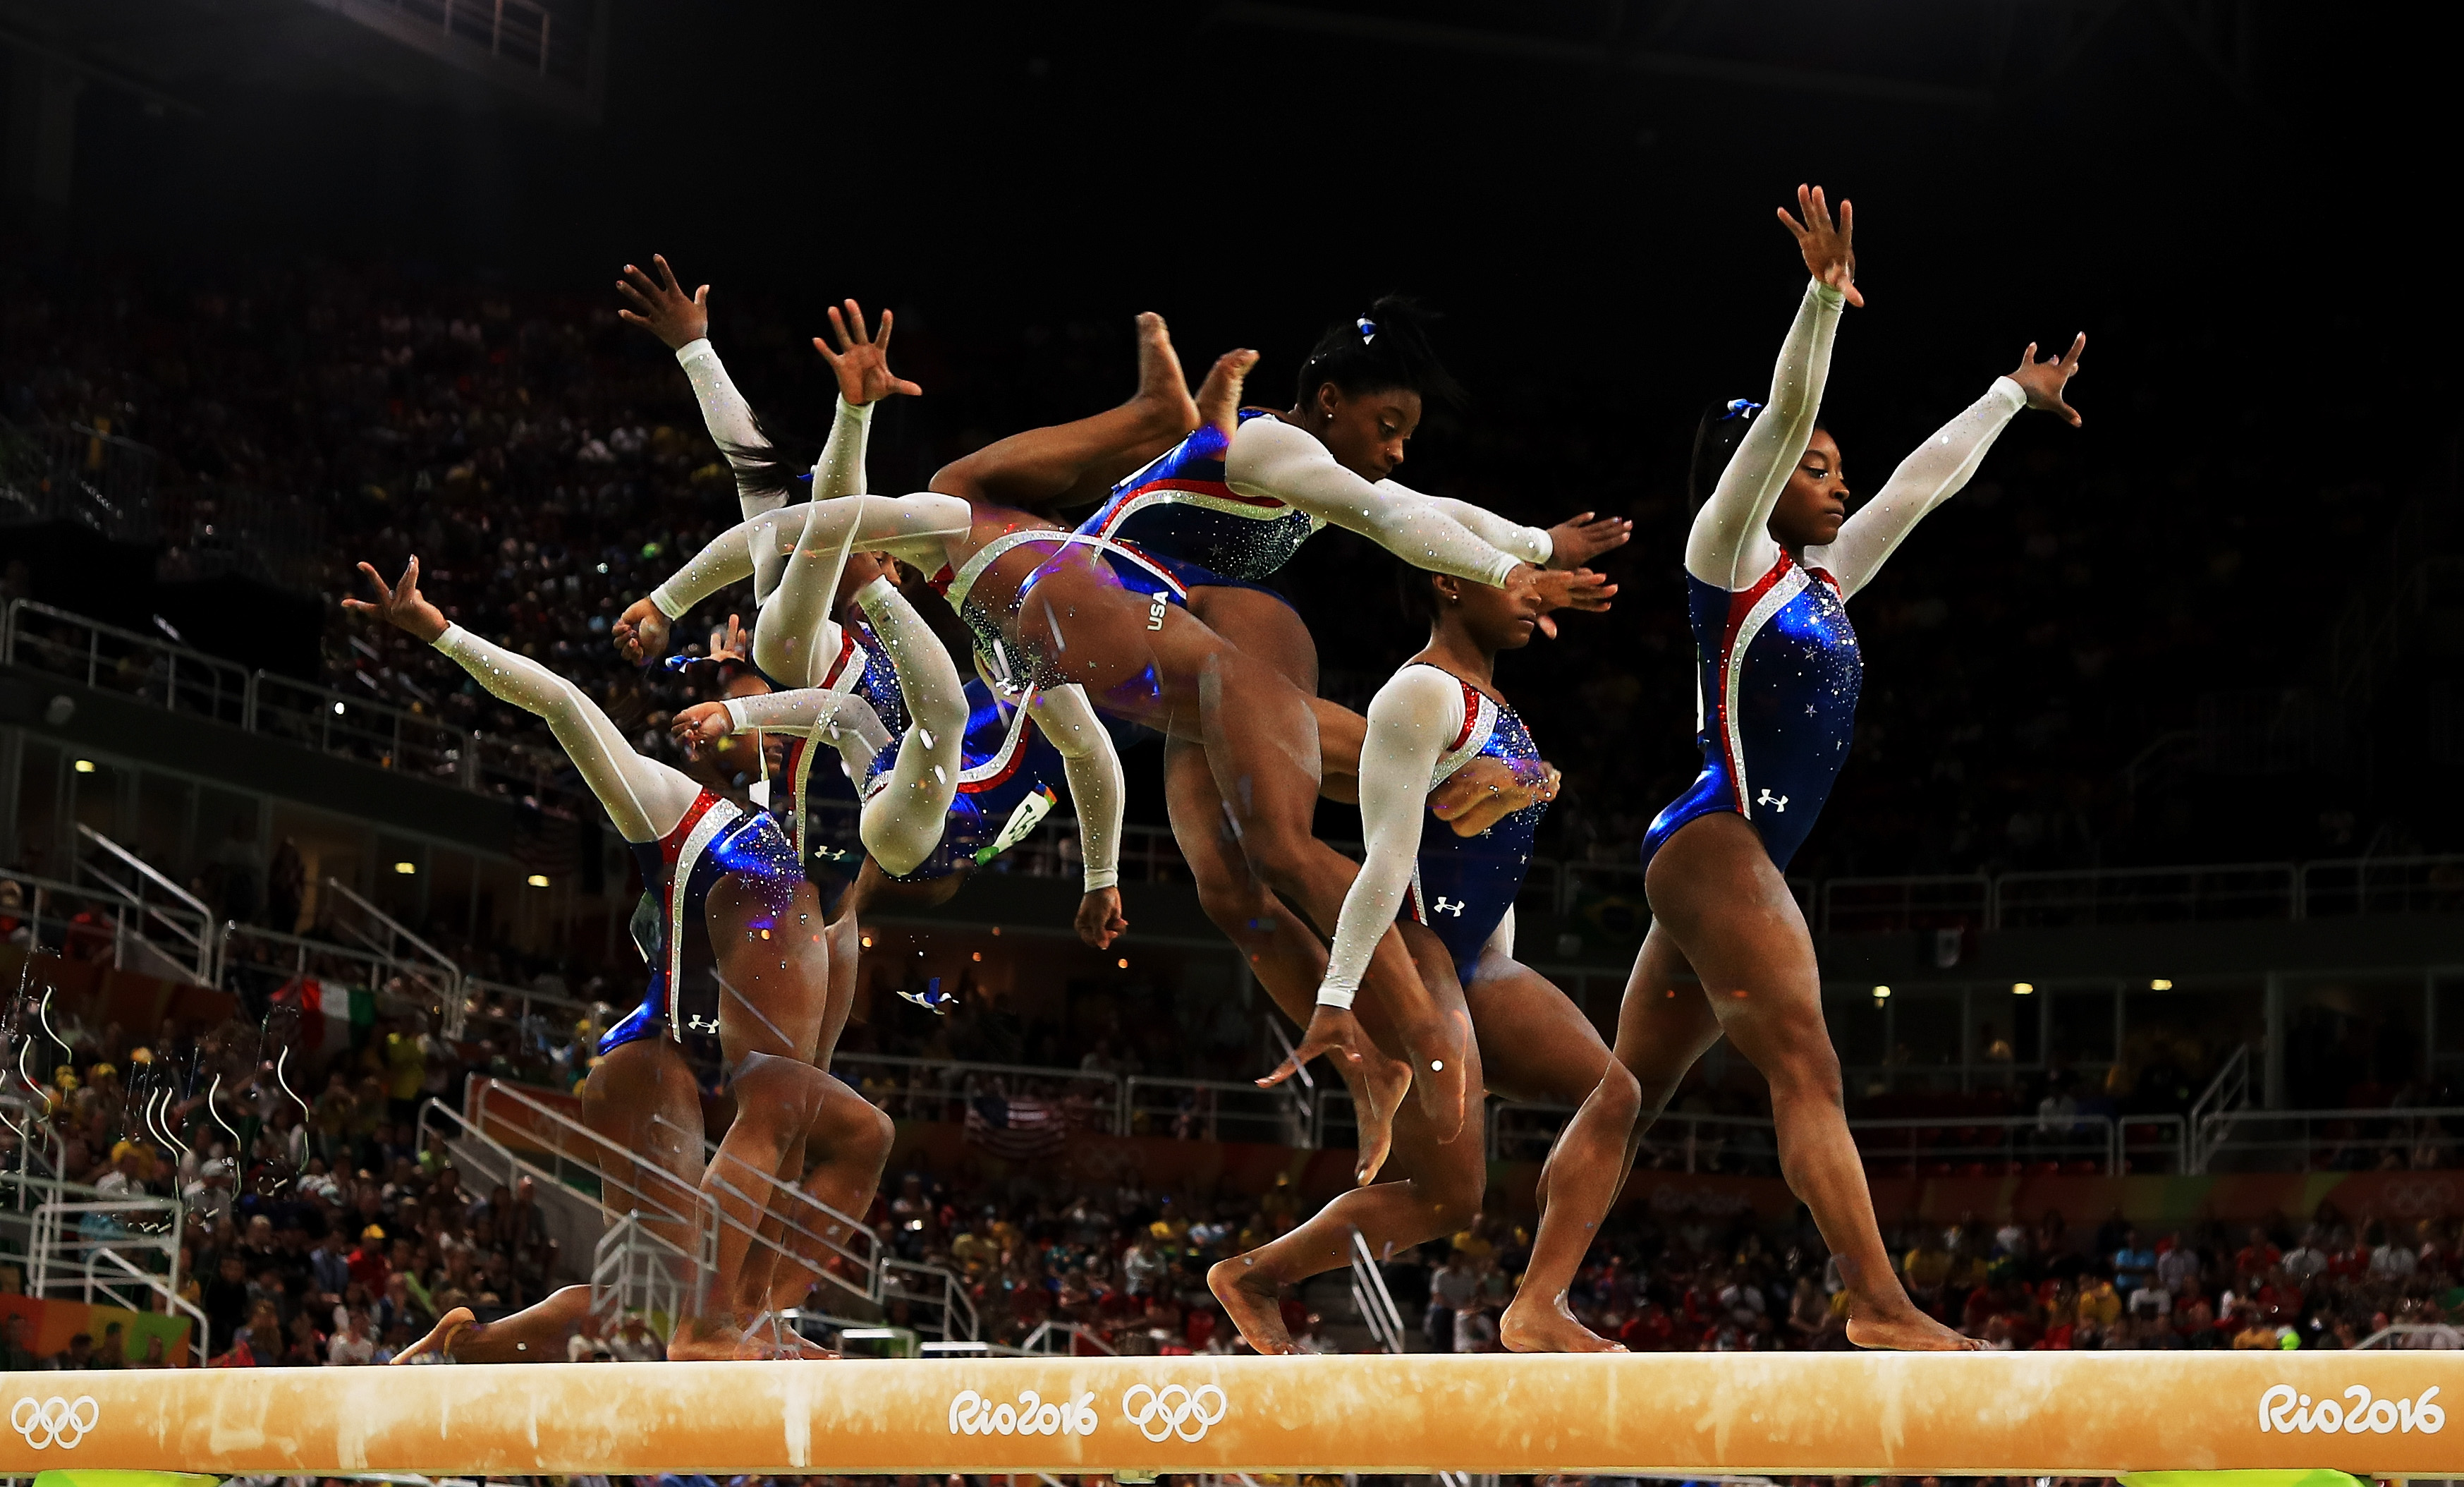 solstice celebration gymnastics meet